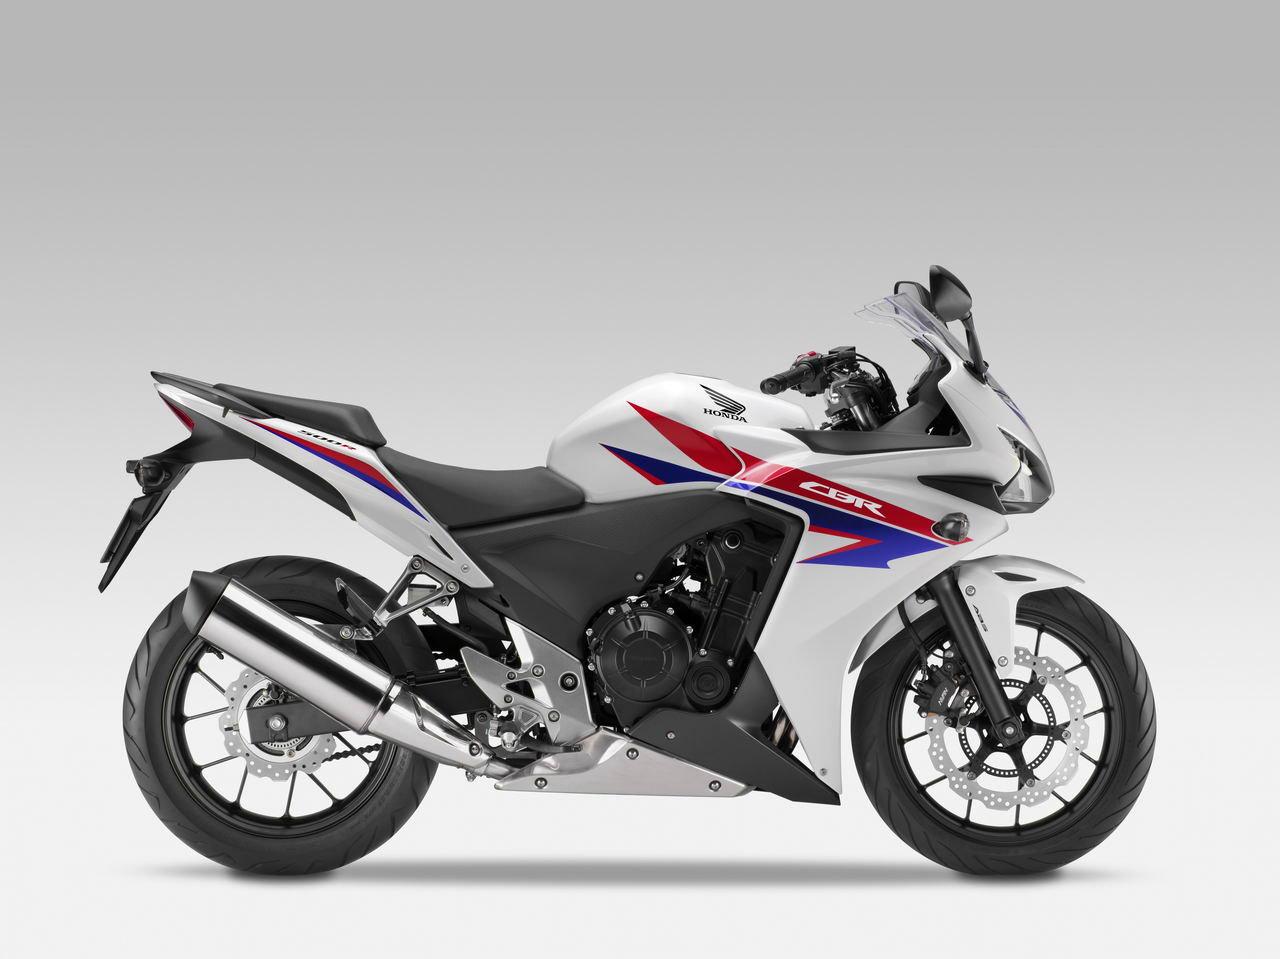 Listino Honda Integra 750 ABSS Scooter oltre 300 - image 14647_honda-cb500rabs on http://moto.motori.net